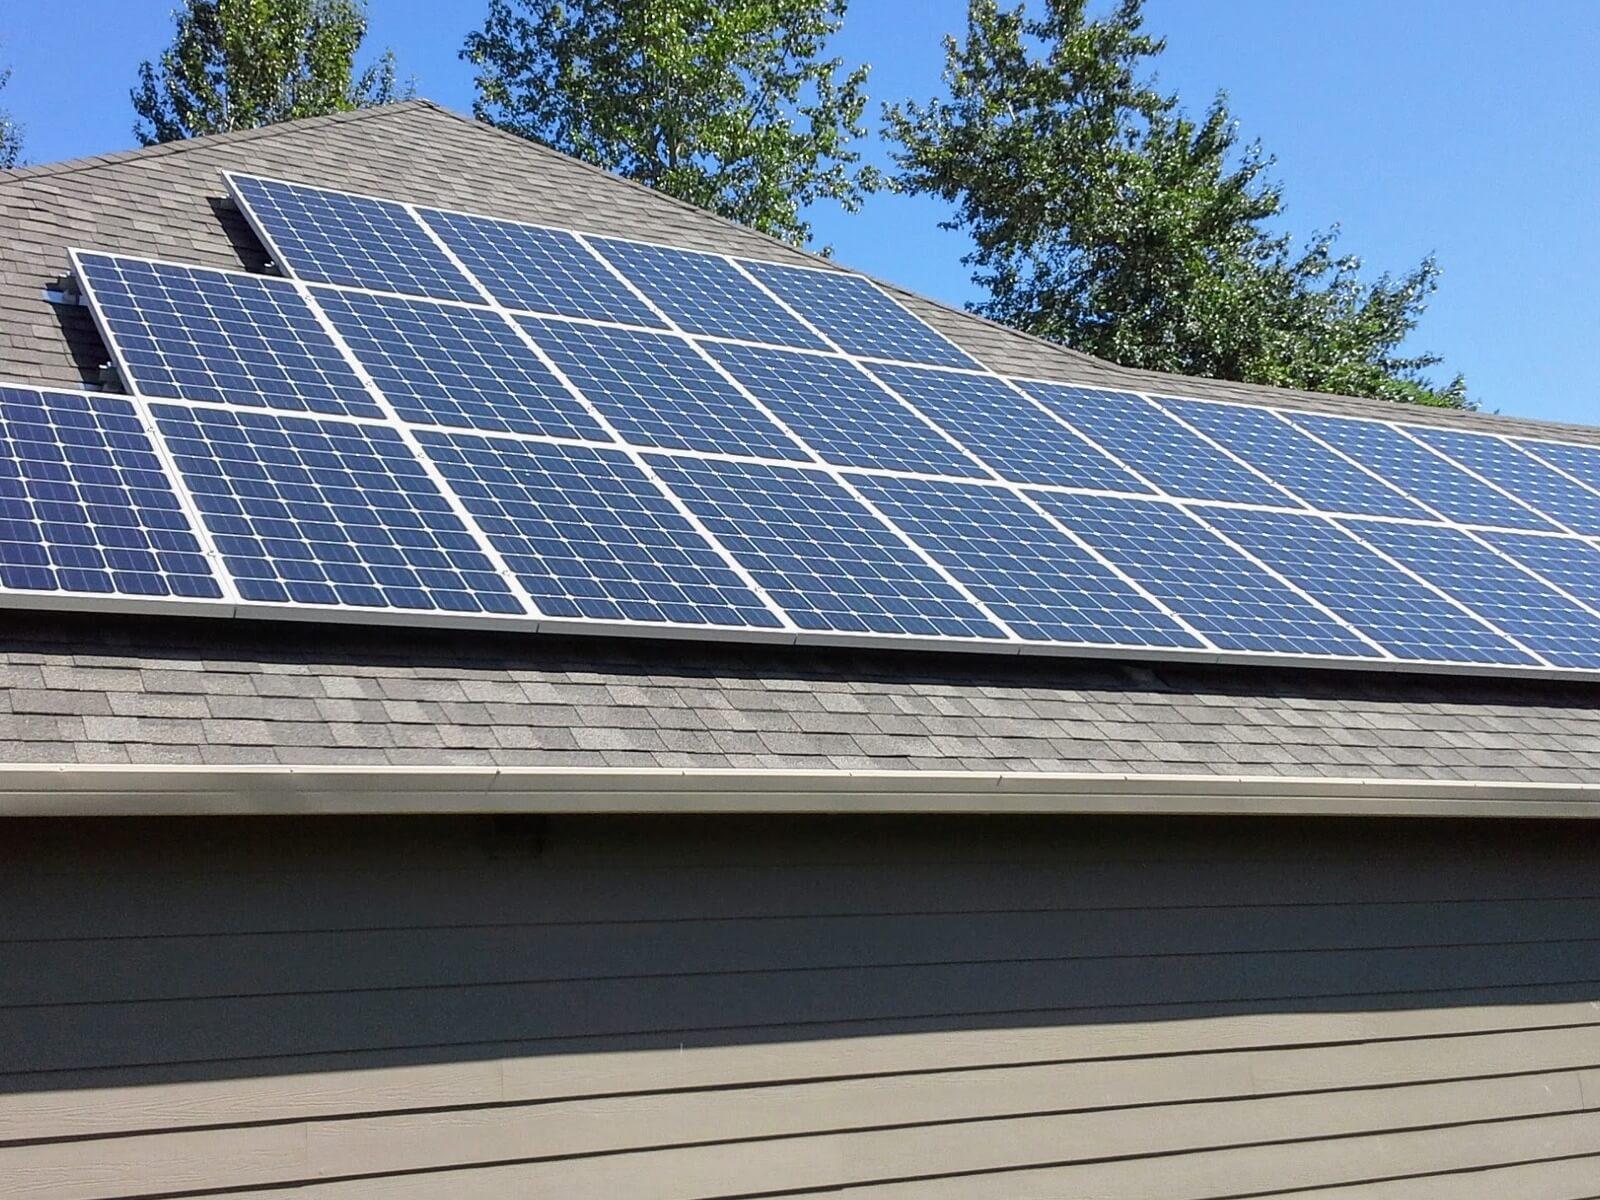 solar energy system on home.jpeg